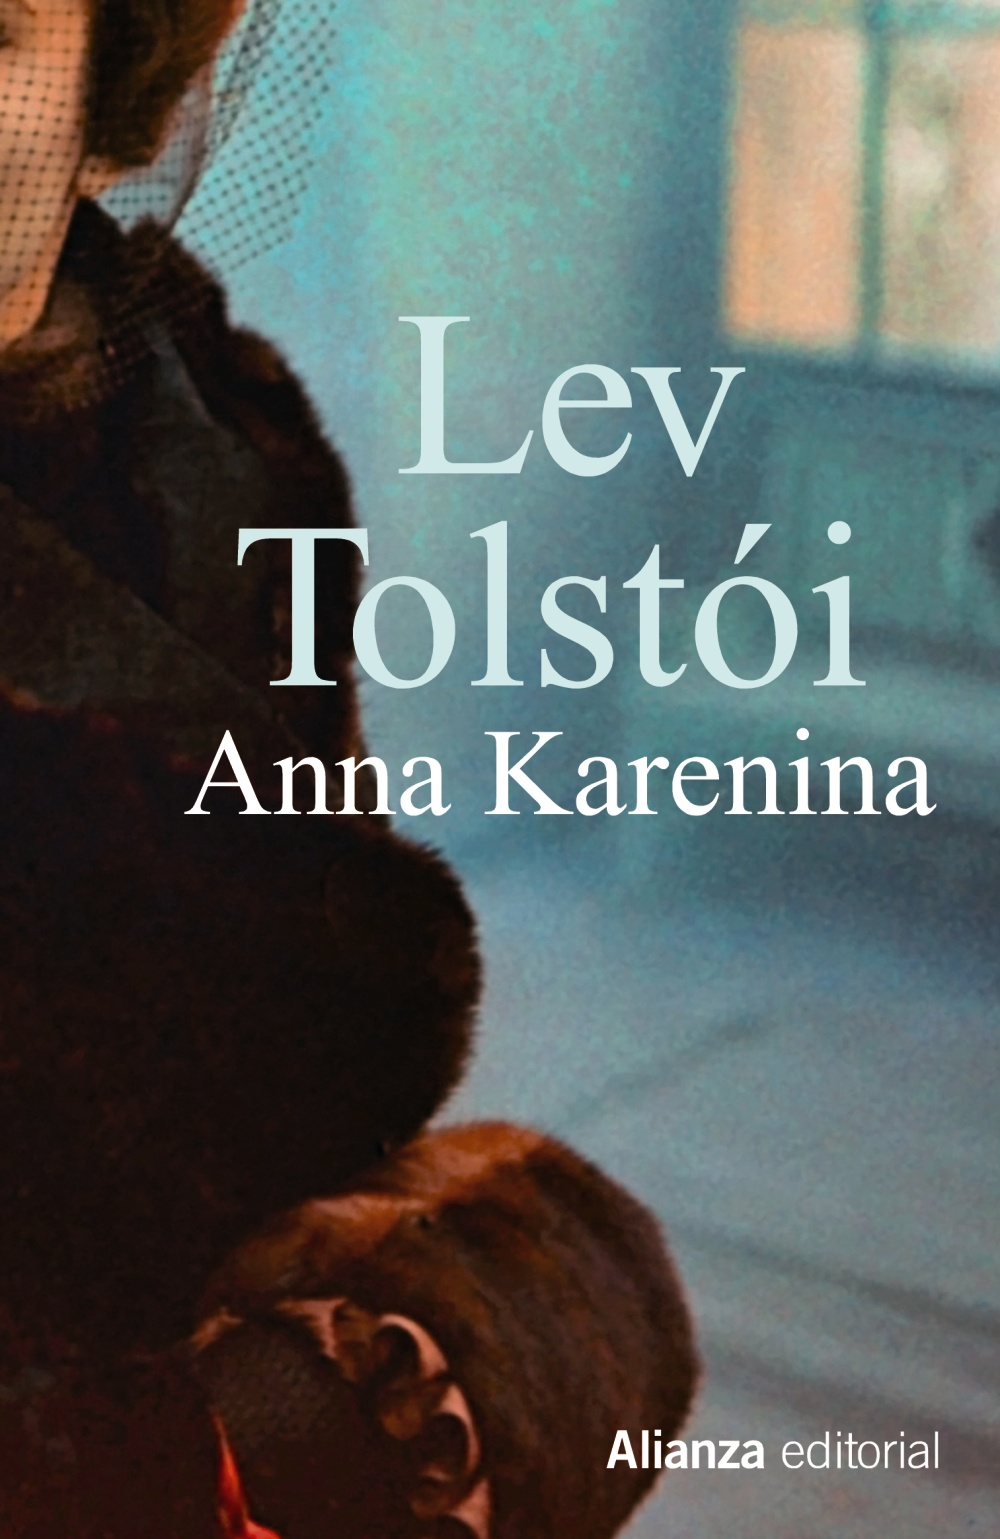 https://labibliotecadebella.blogspot.com/2018/09/resena-anna-karenina-leon-tolstoi.html